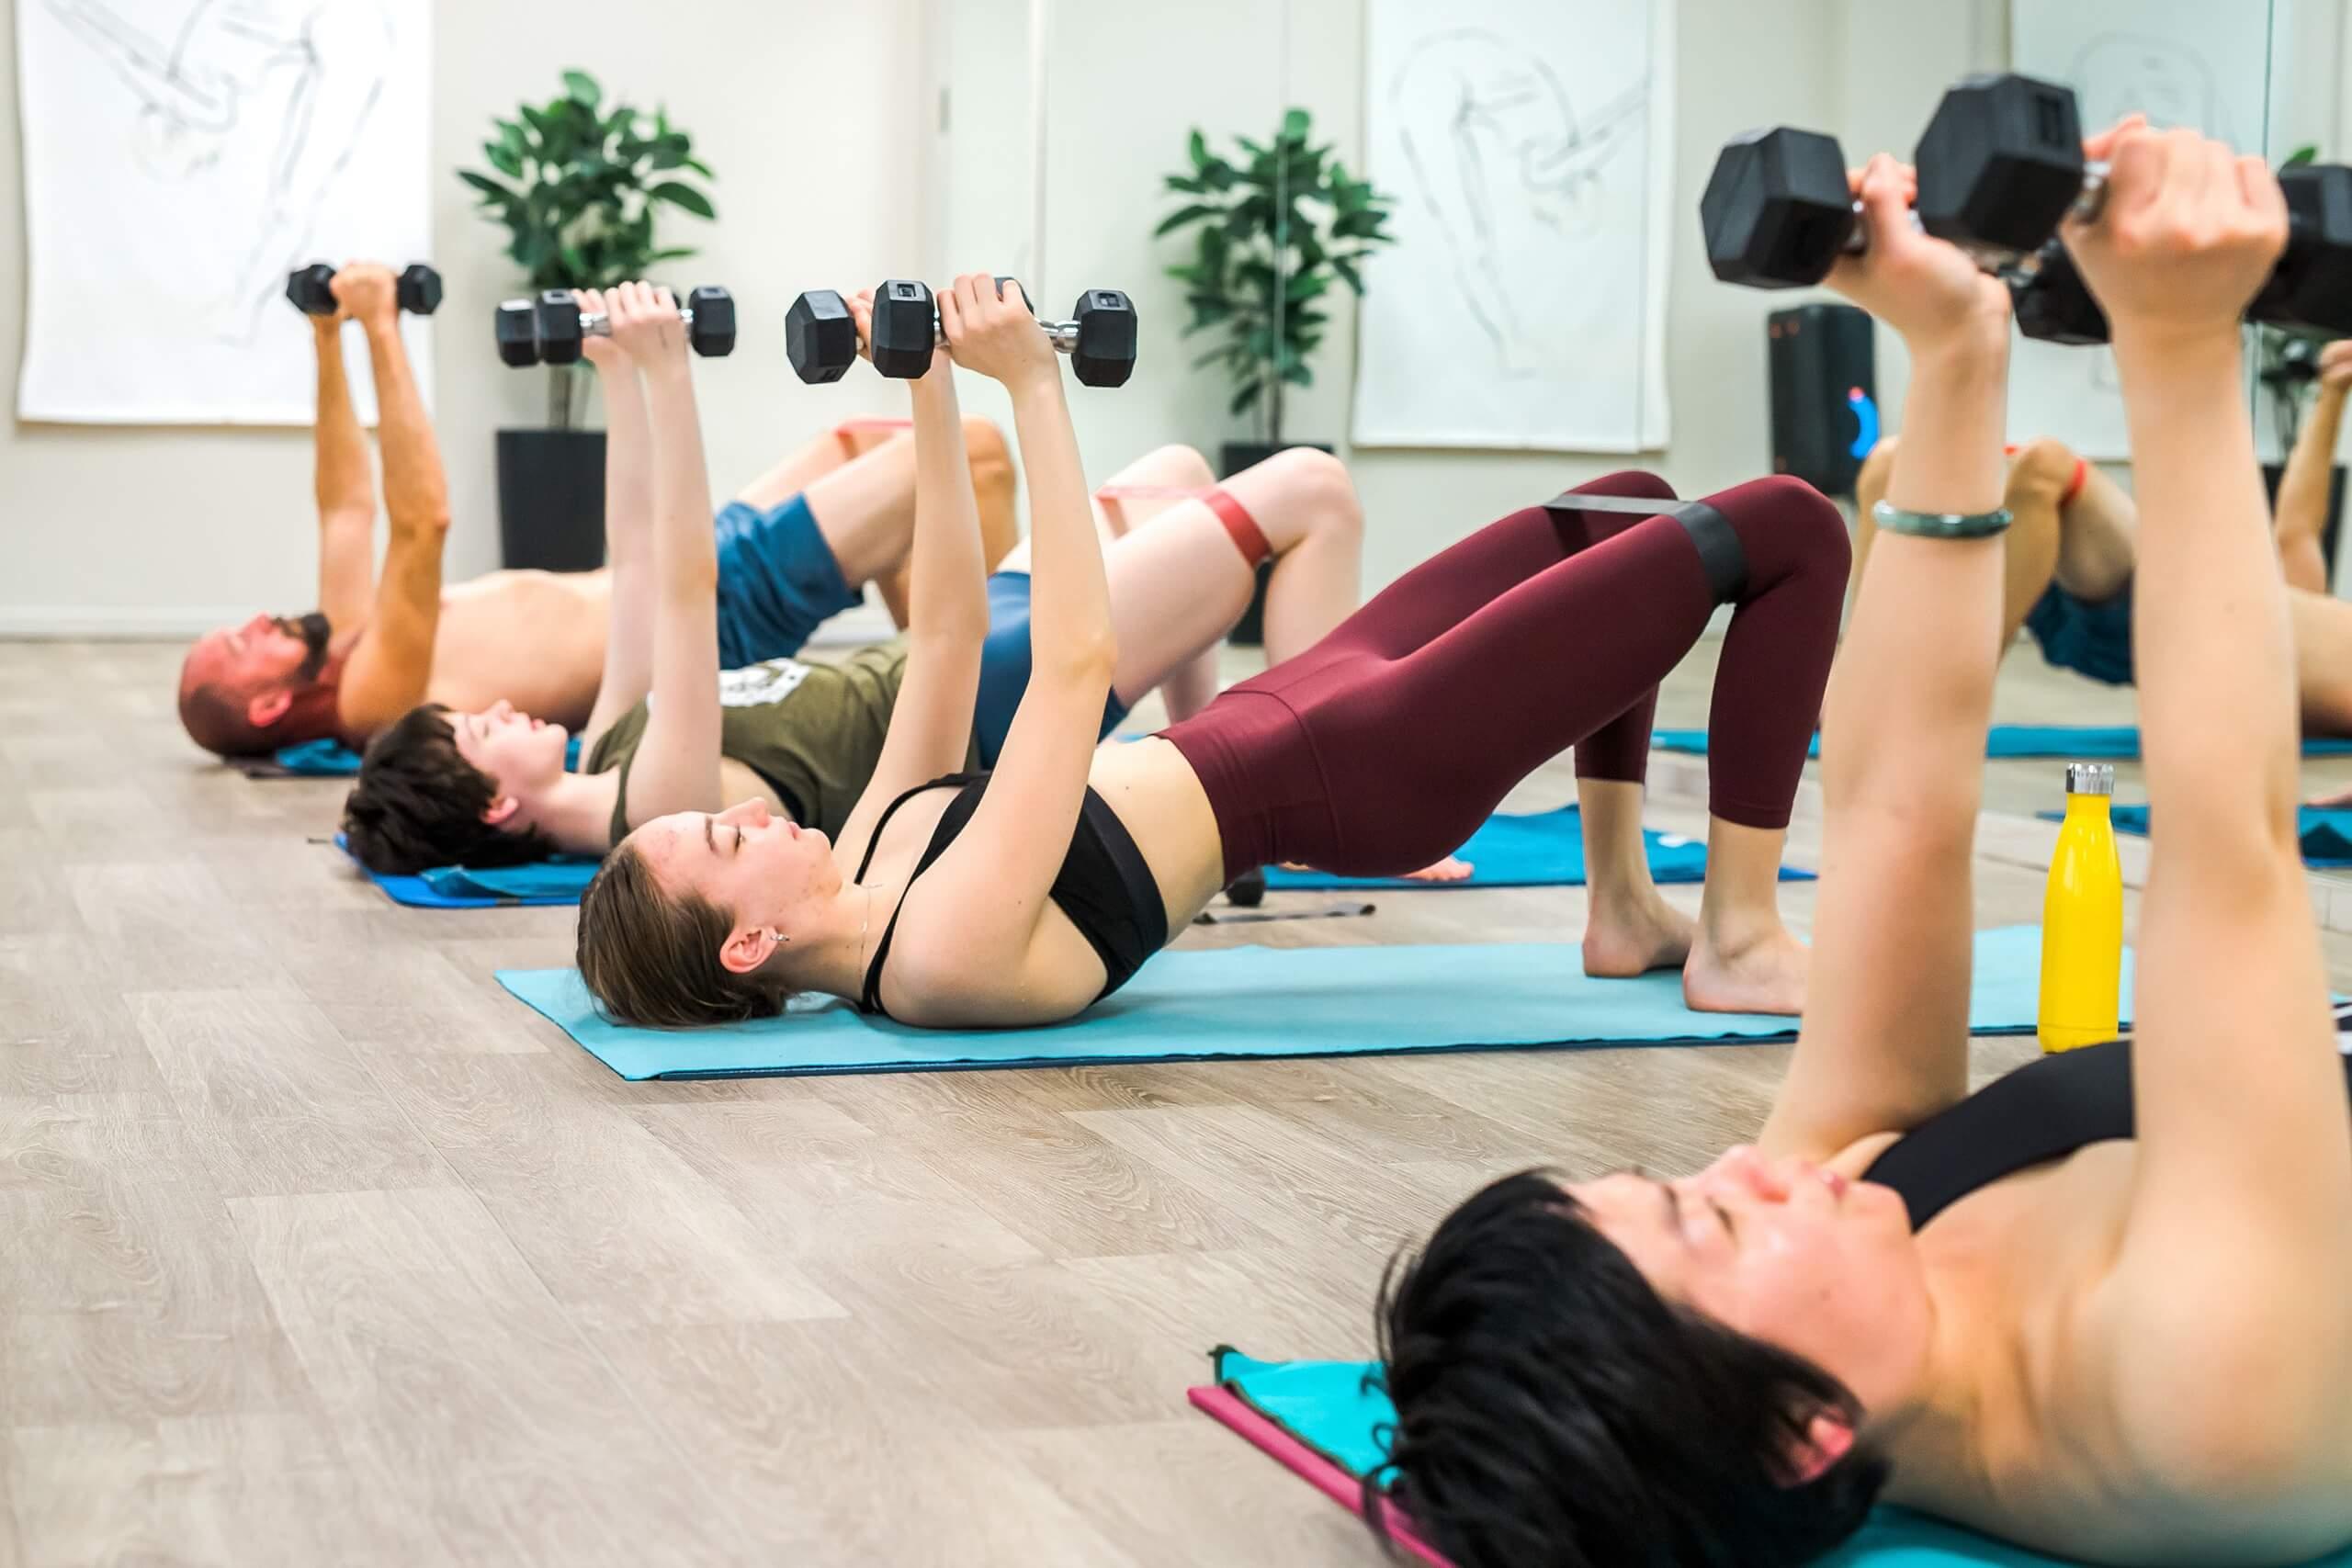 Wellington yoga sessions that focus on speed